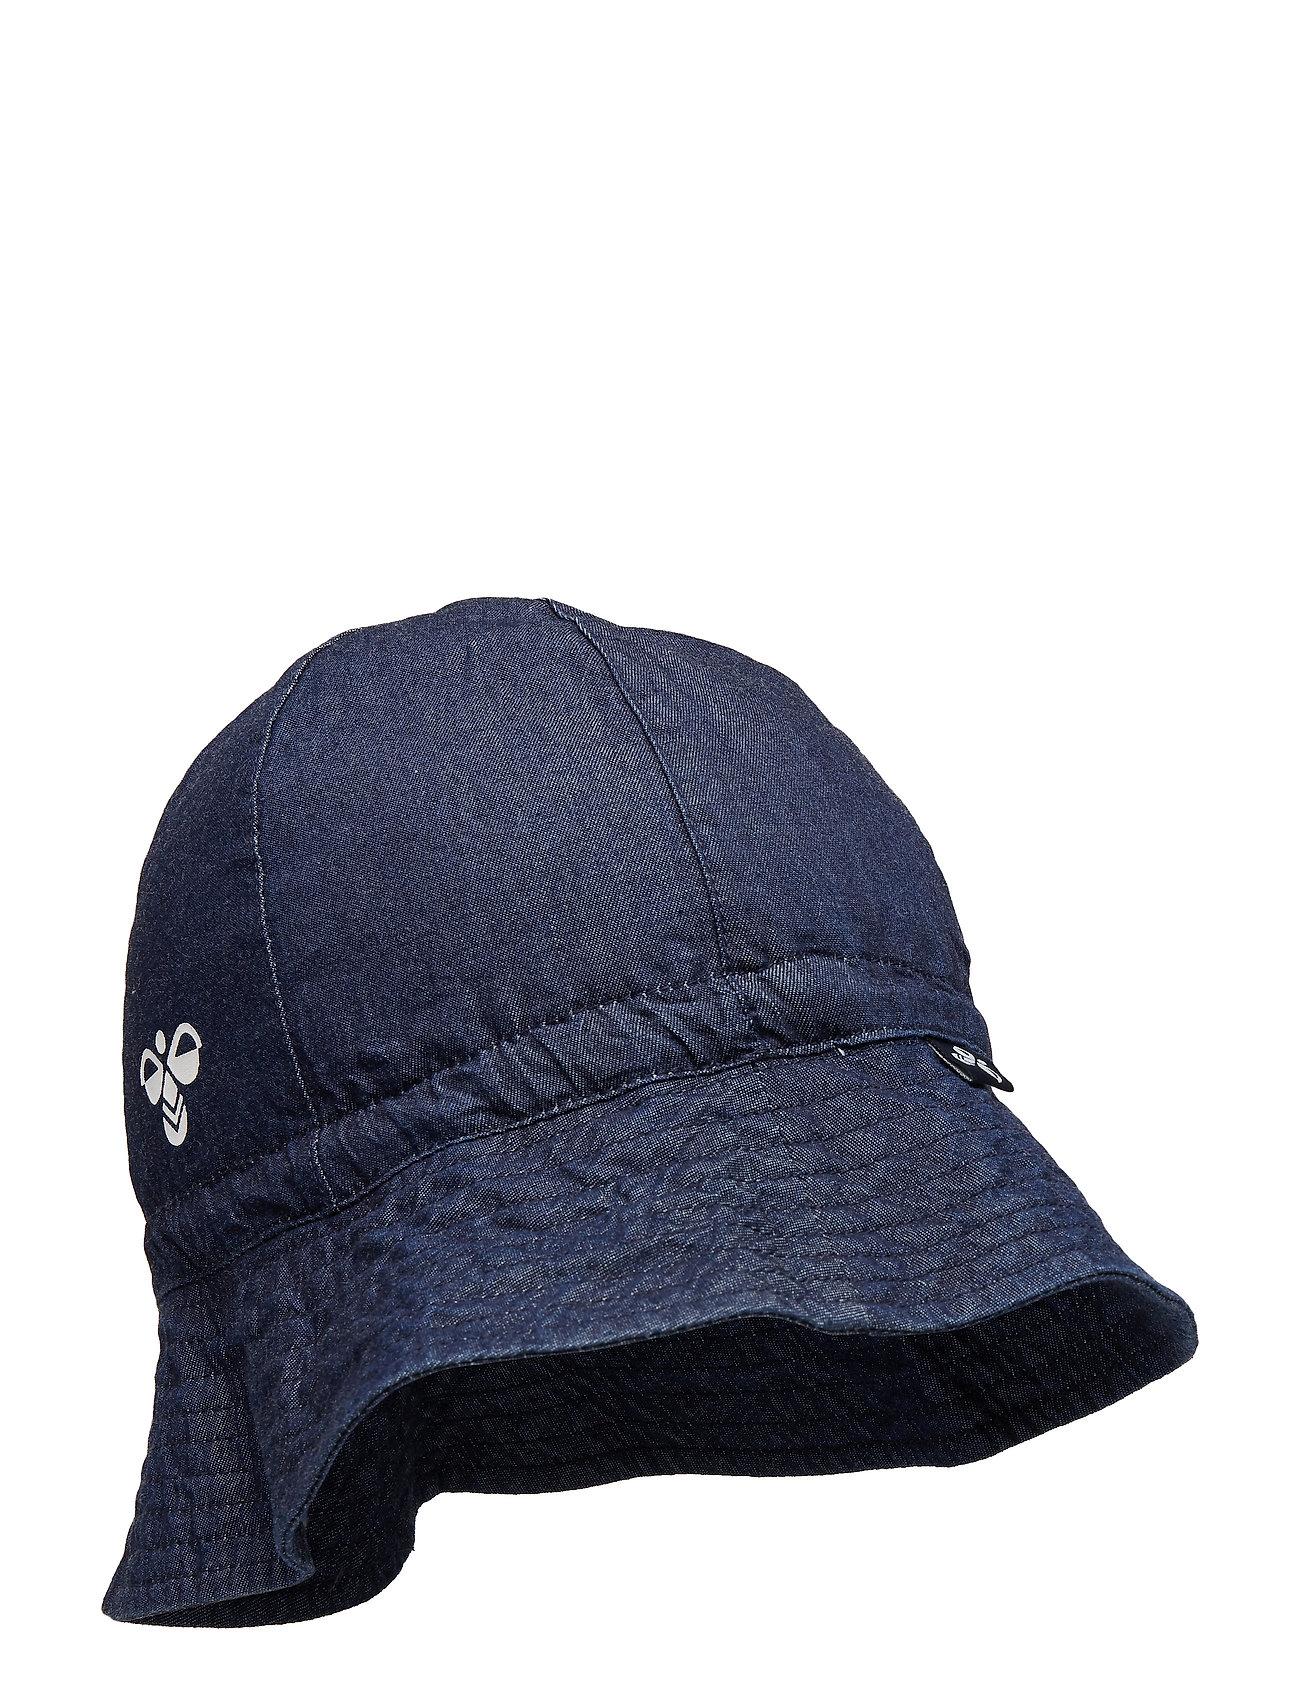 Hummel HMLJACO HAT - DENIM